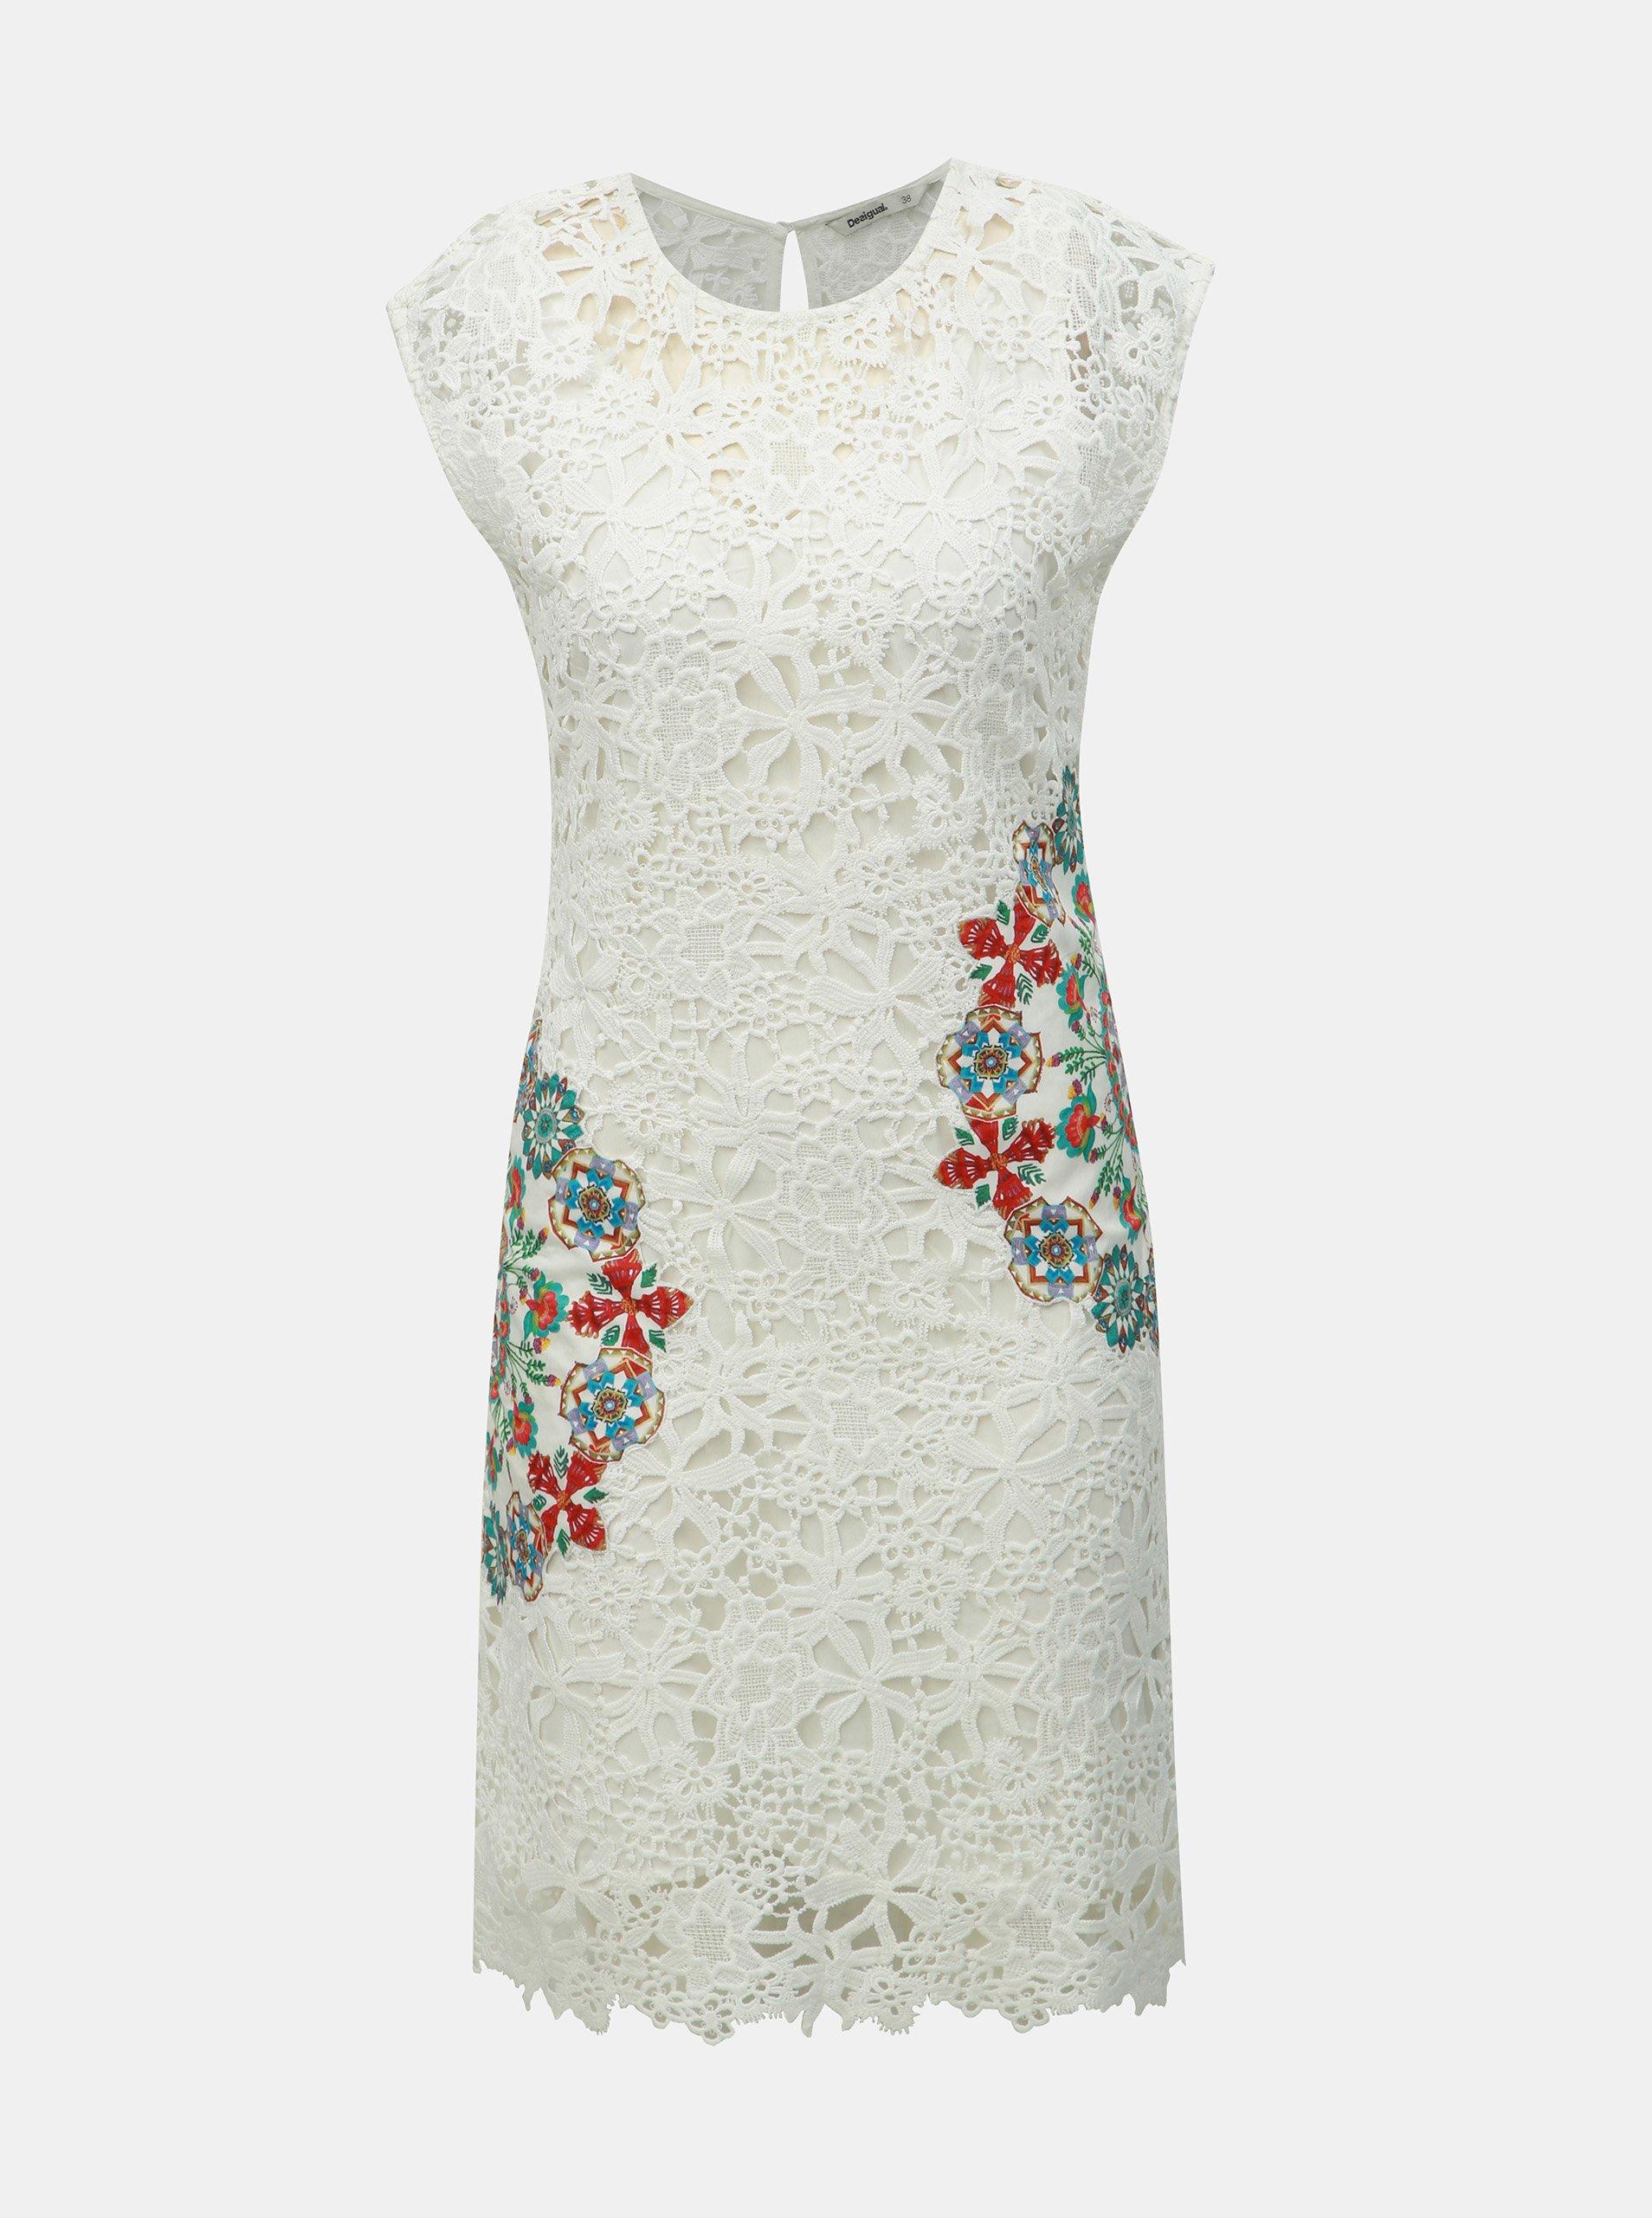 9205432979d8 Bílé krajkové šaty Desigual Malpaso